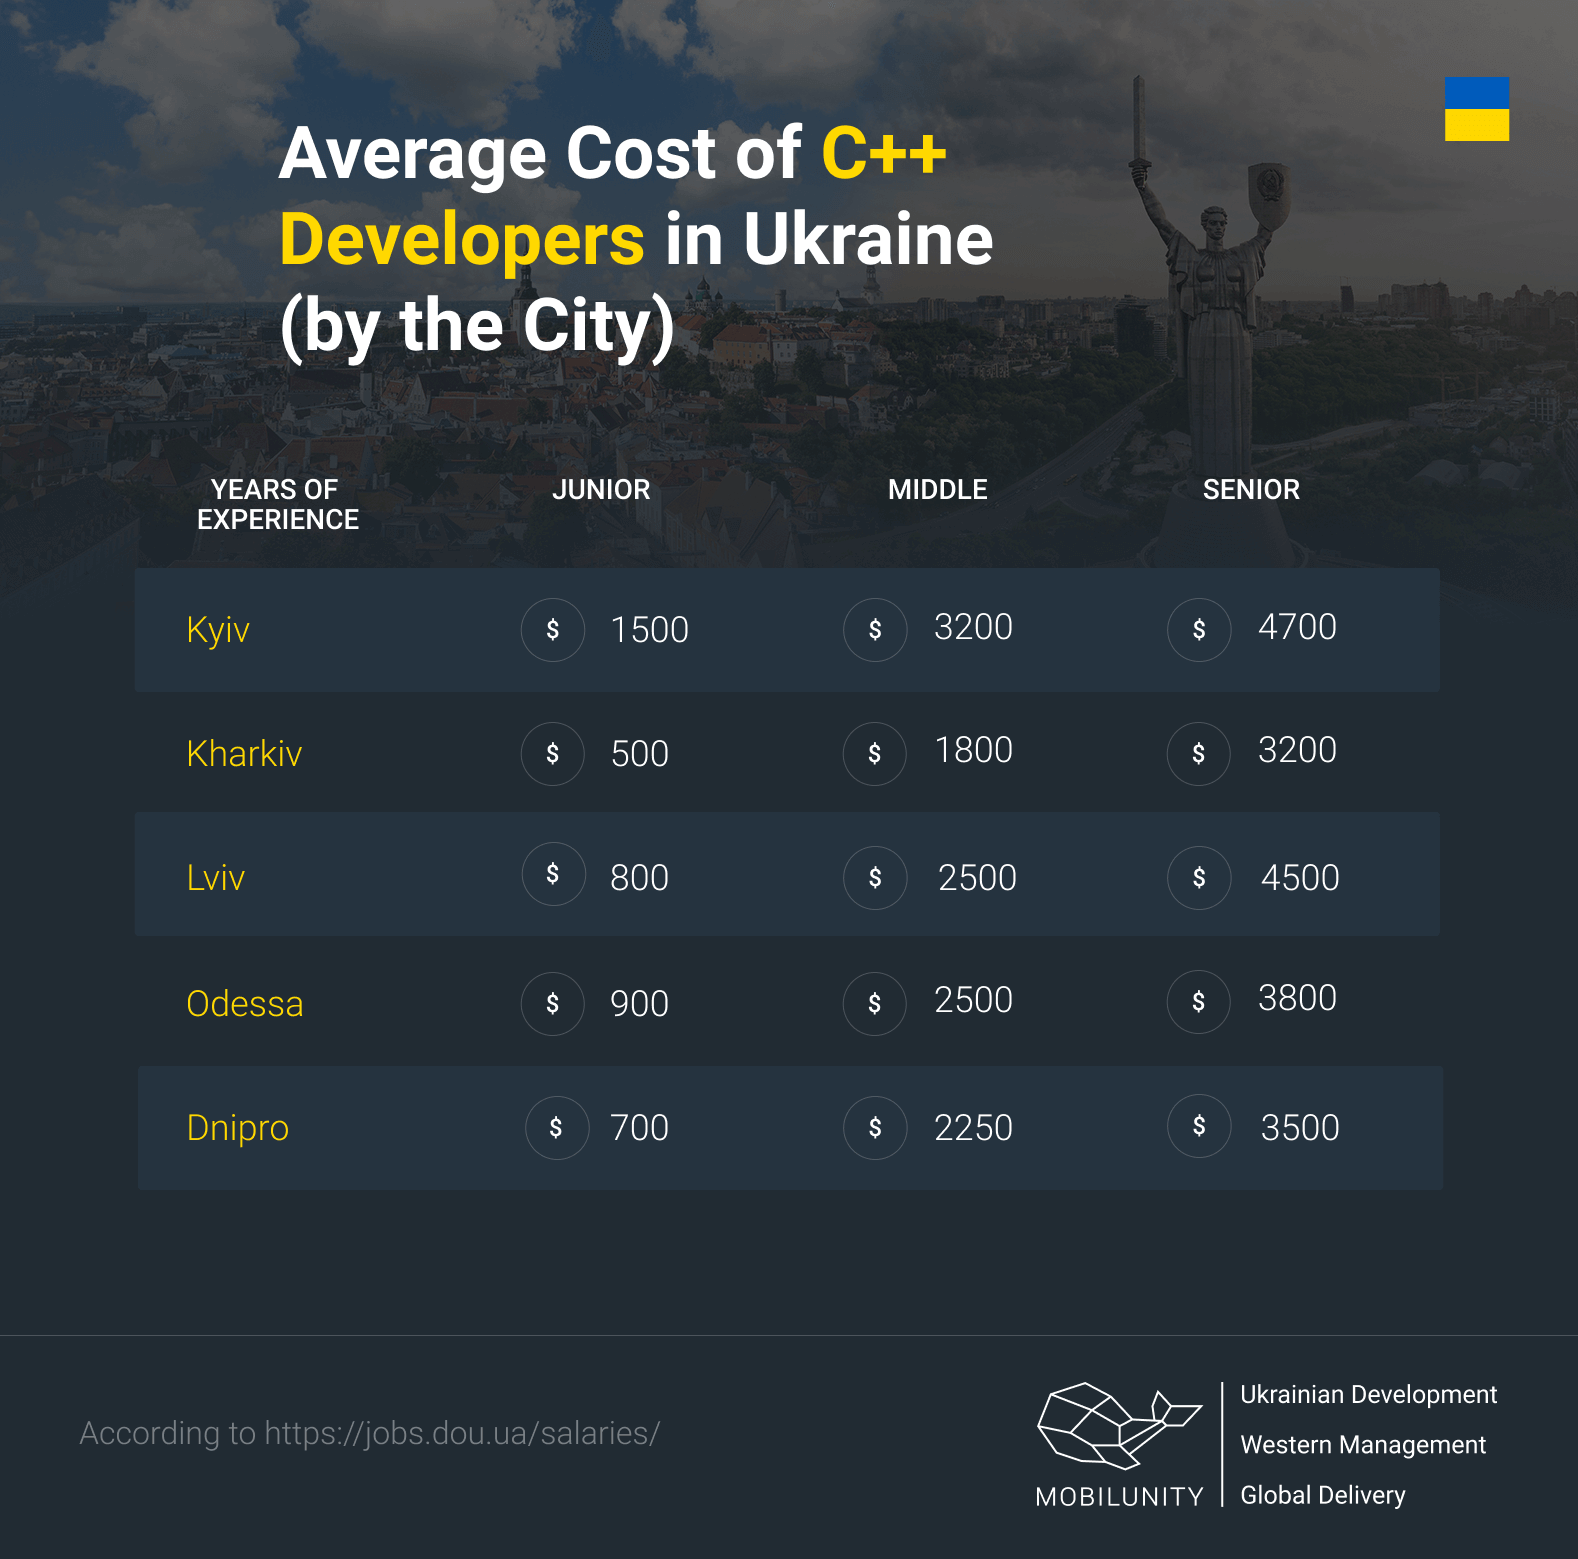 cost of C++ developer in Ukraine